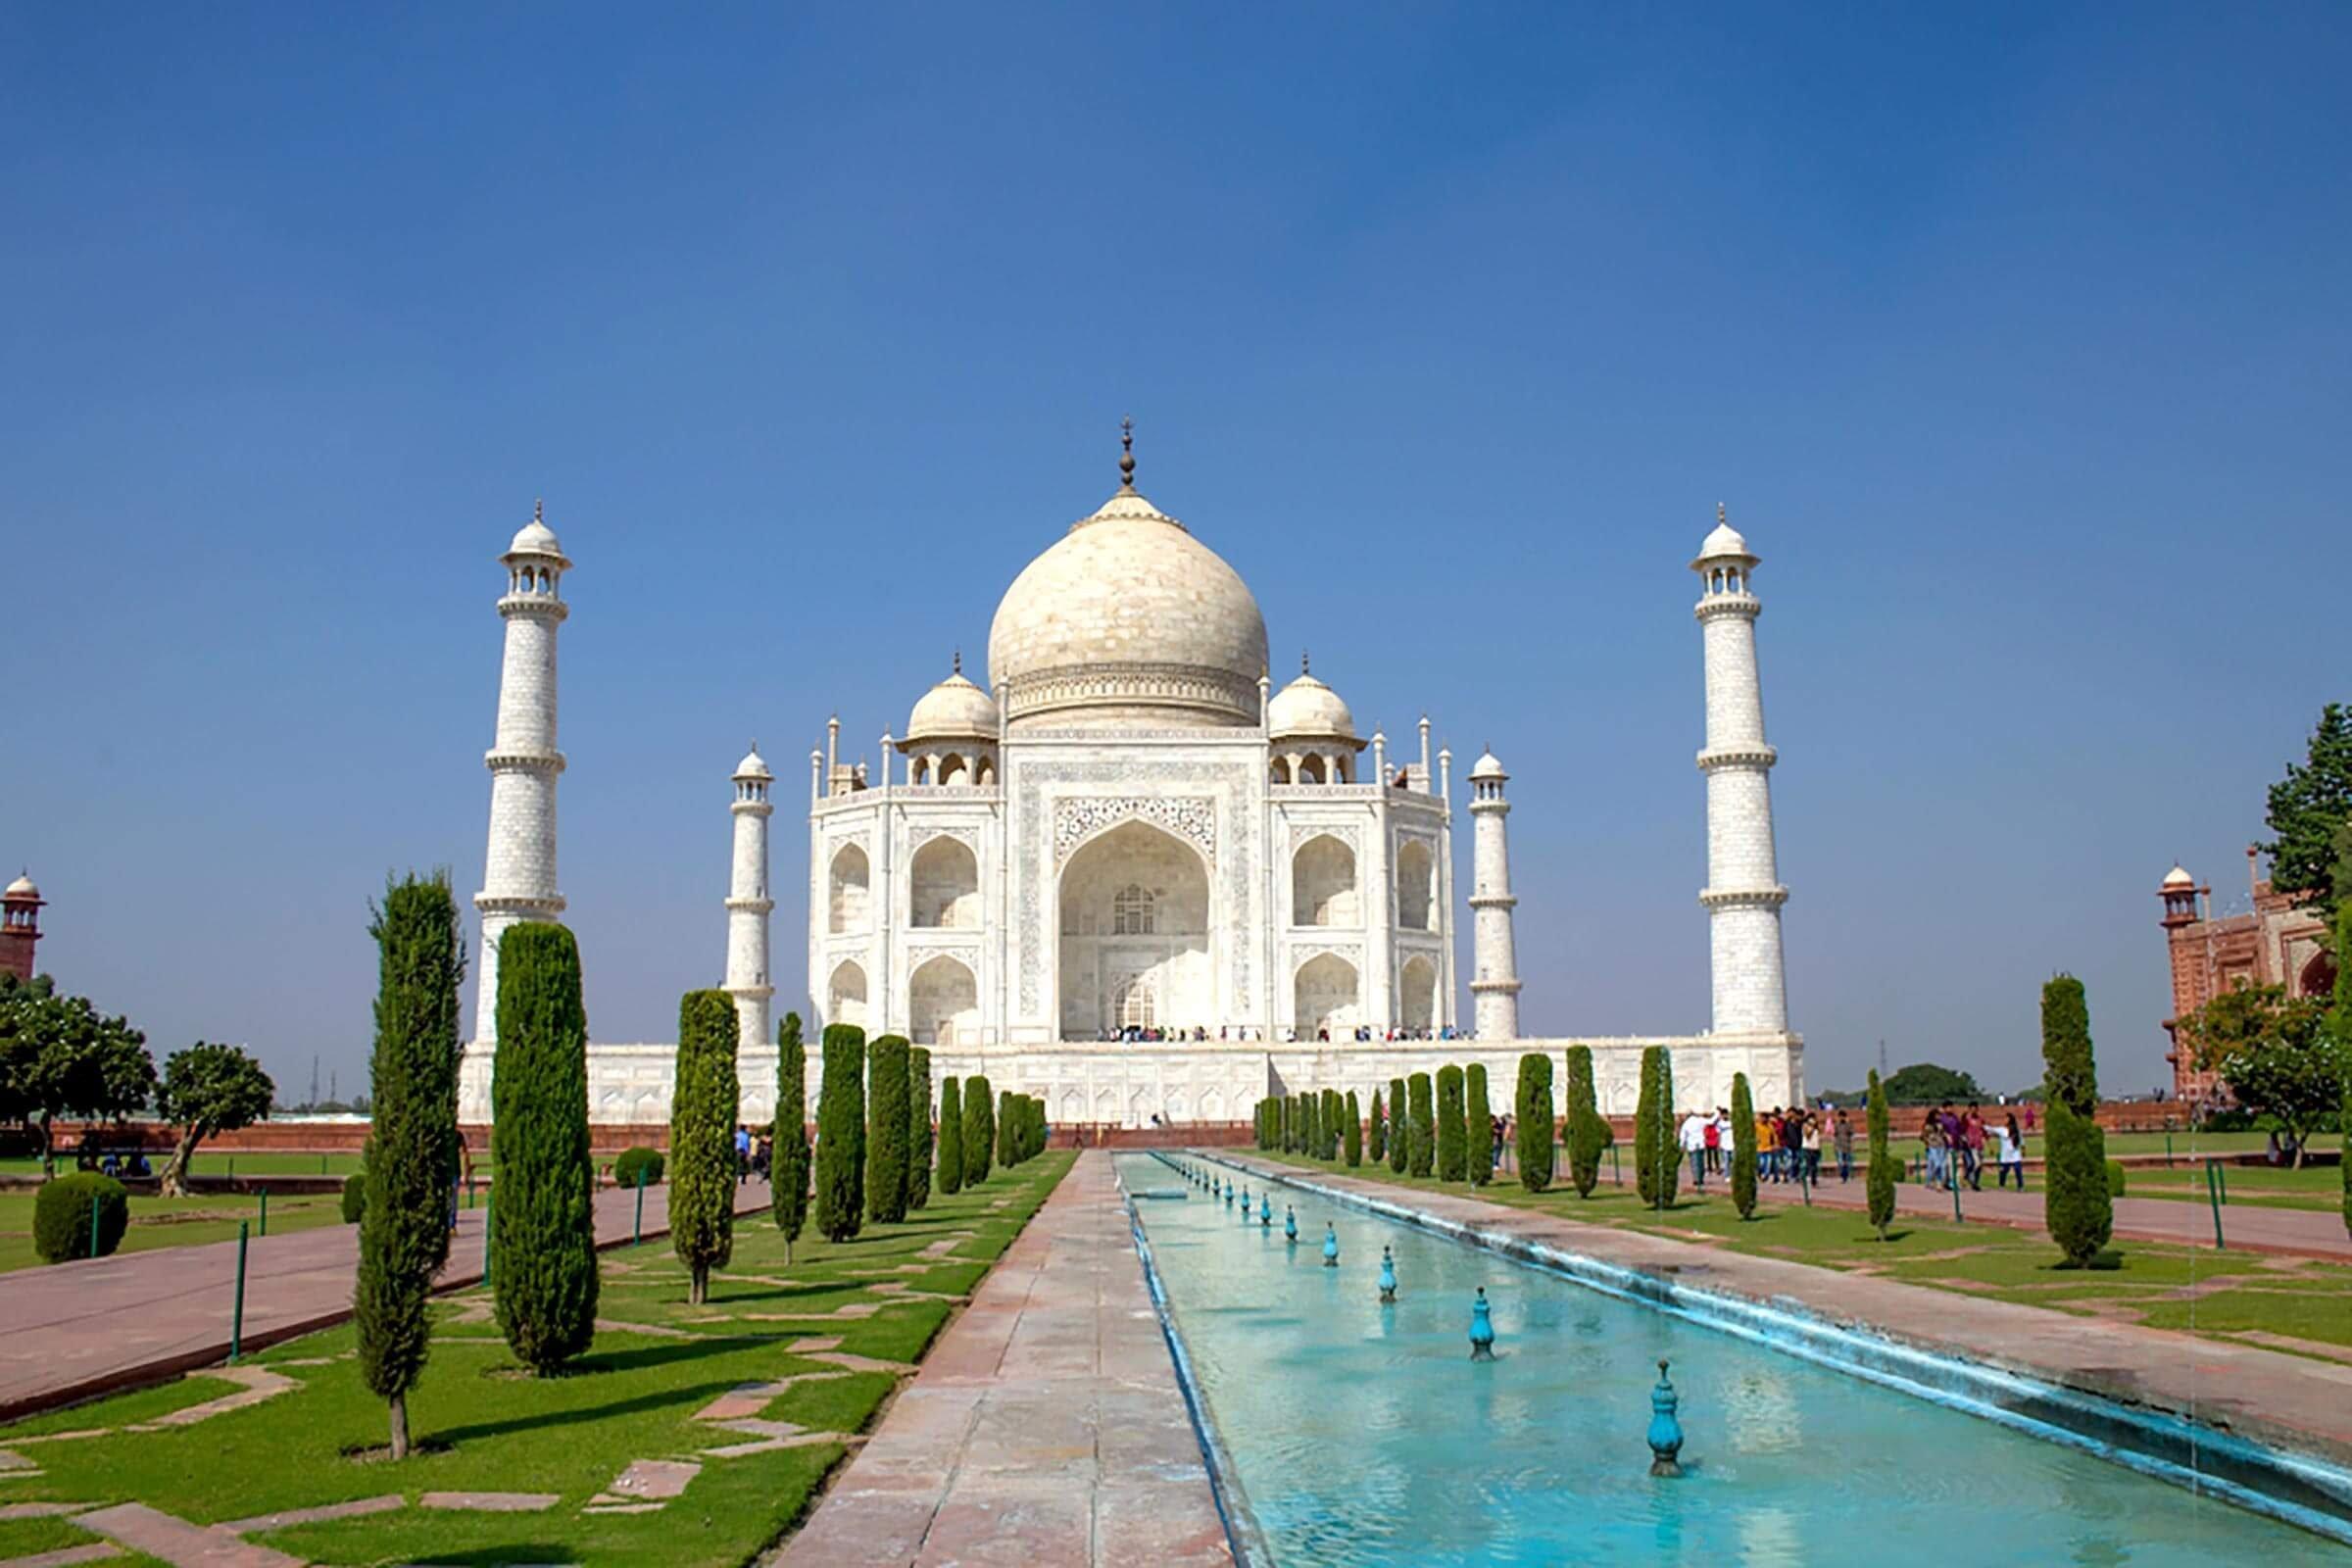 Taj Mahal the mausoleum in Agra India